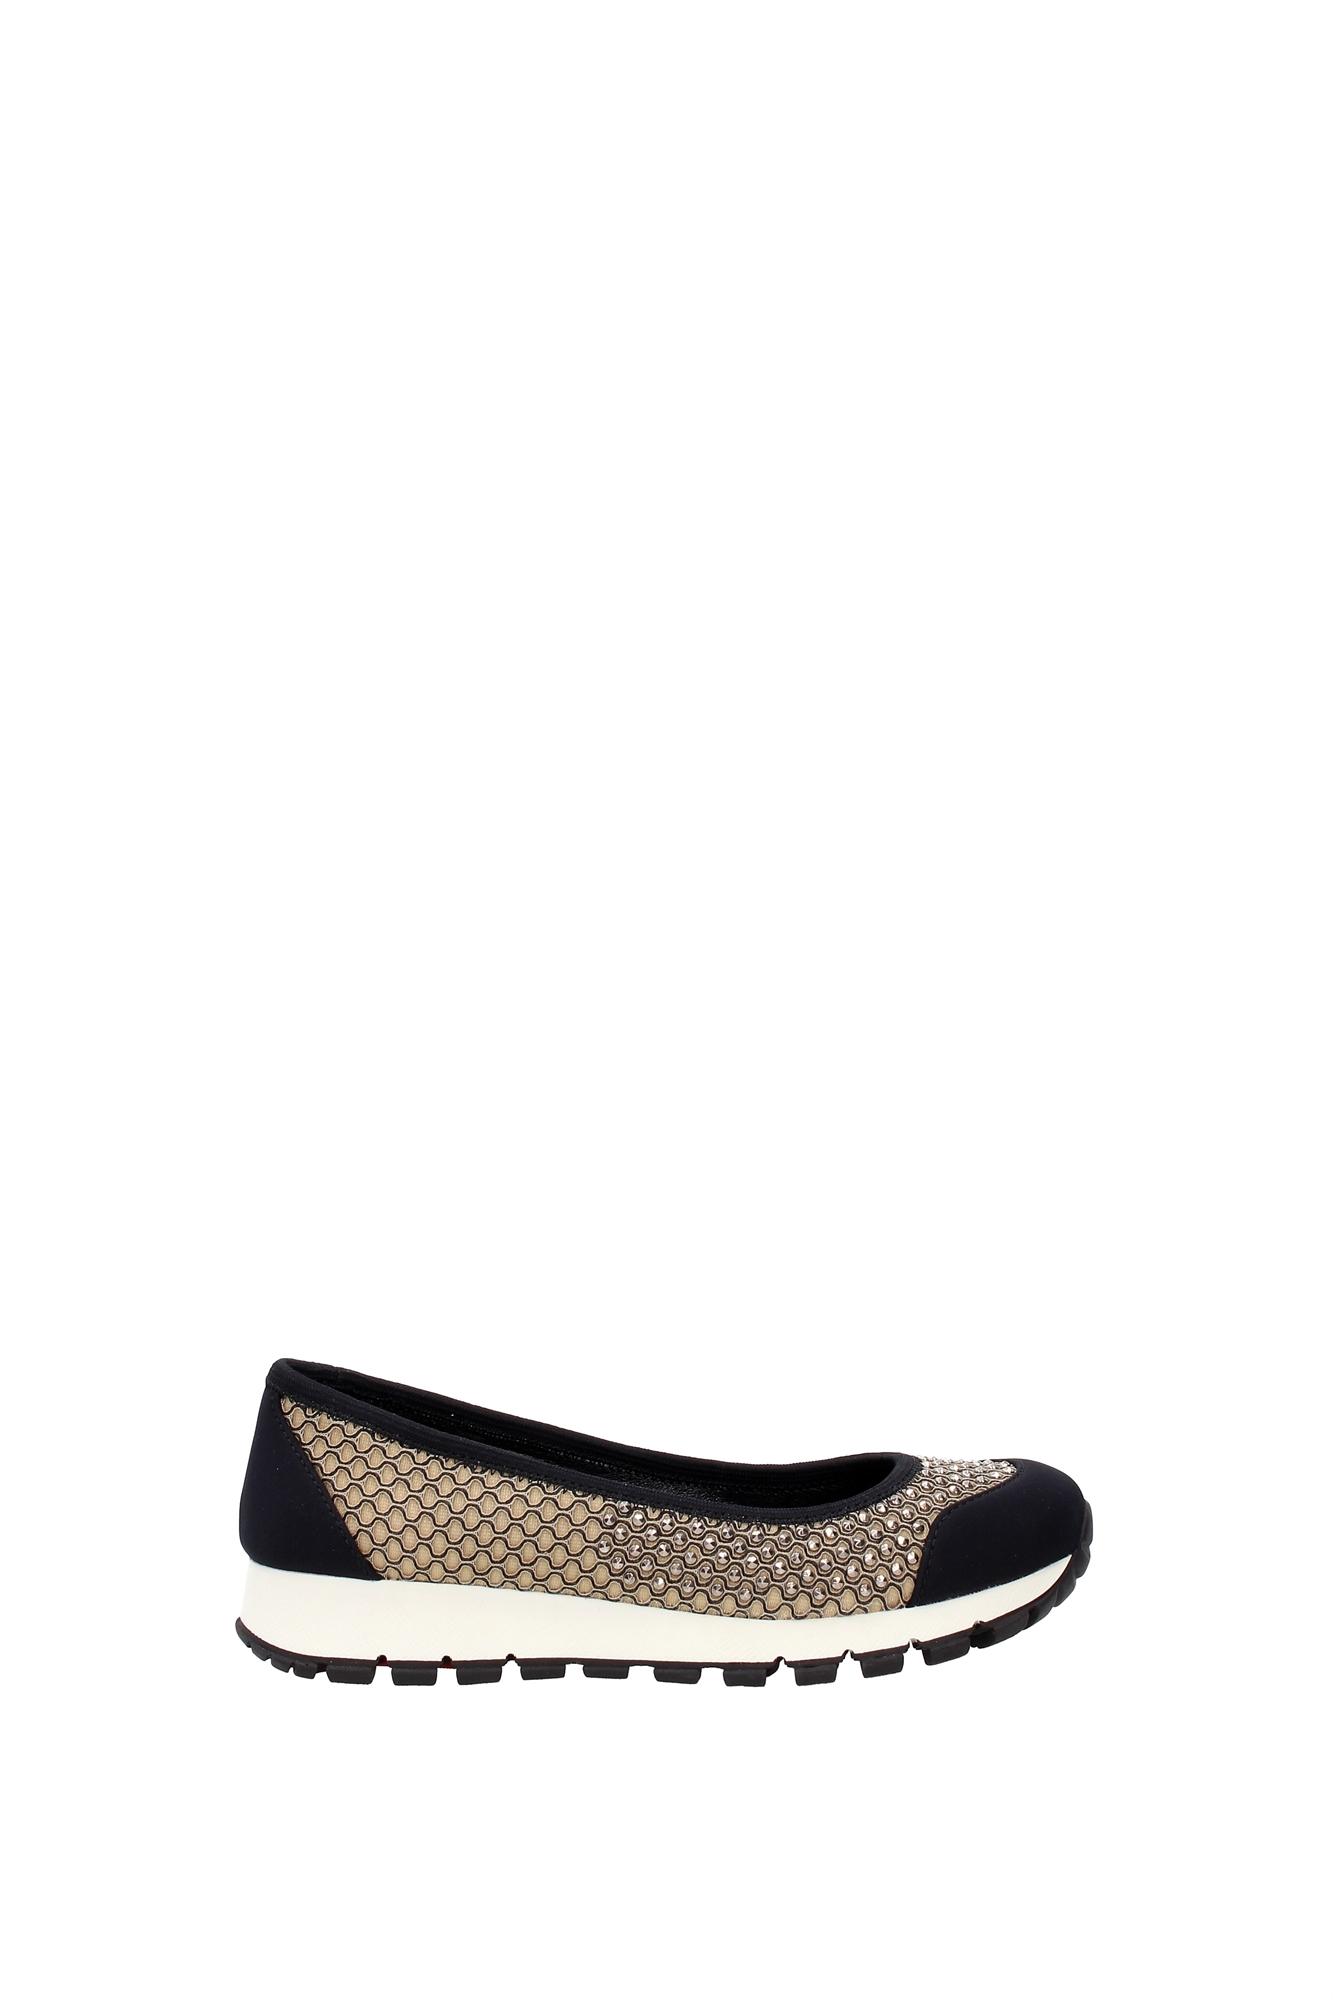 sneakers prada damen stoff beige 3f6158deserto ebay. Black Bedroom Furniture Sets. Home Design Ideas